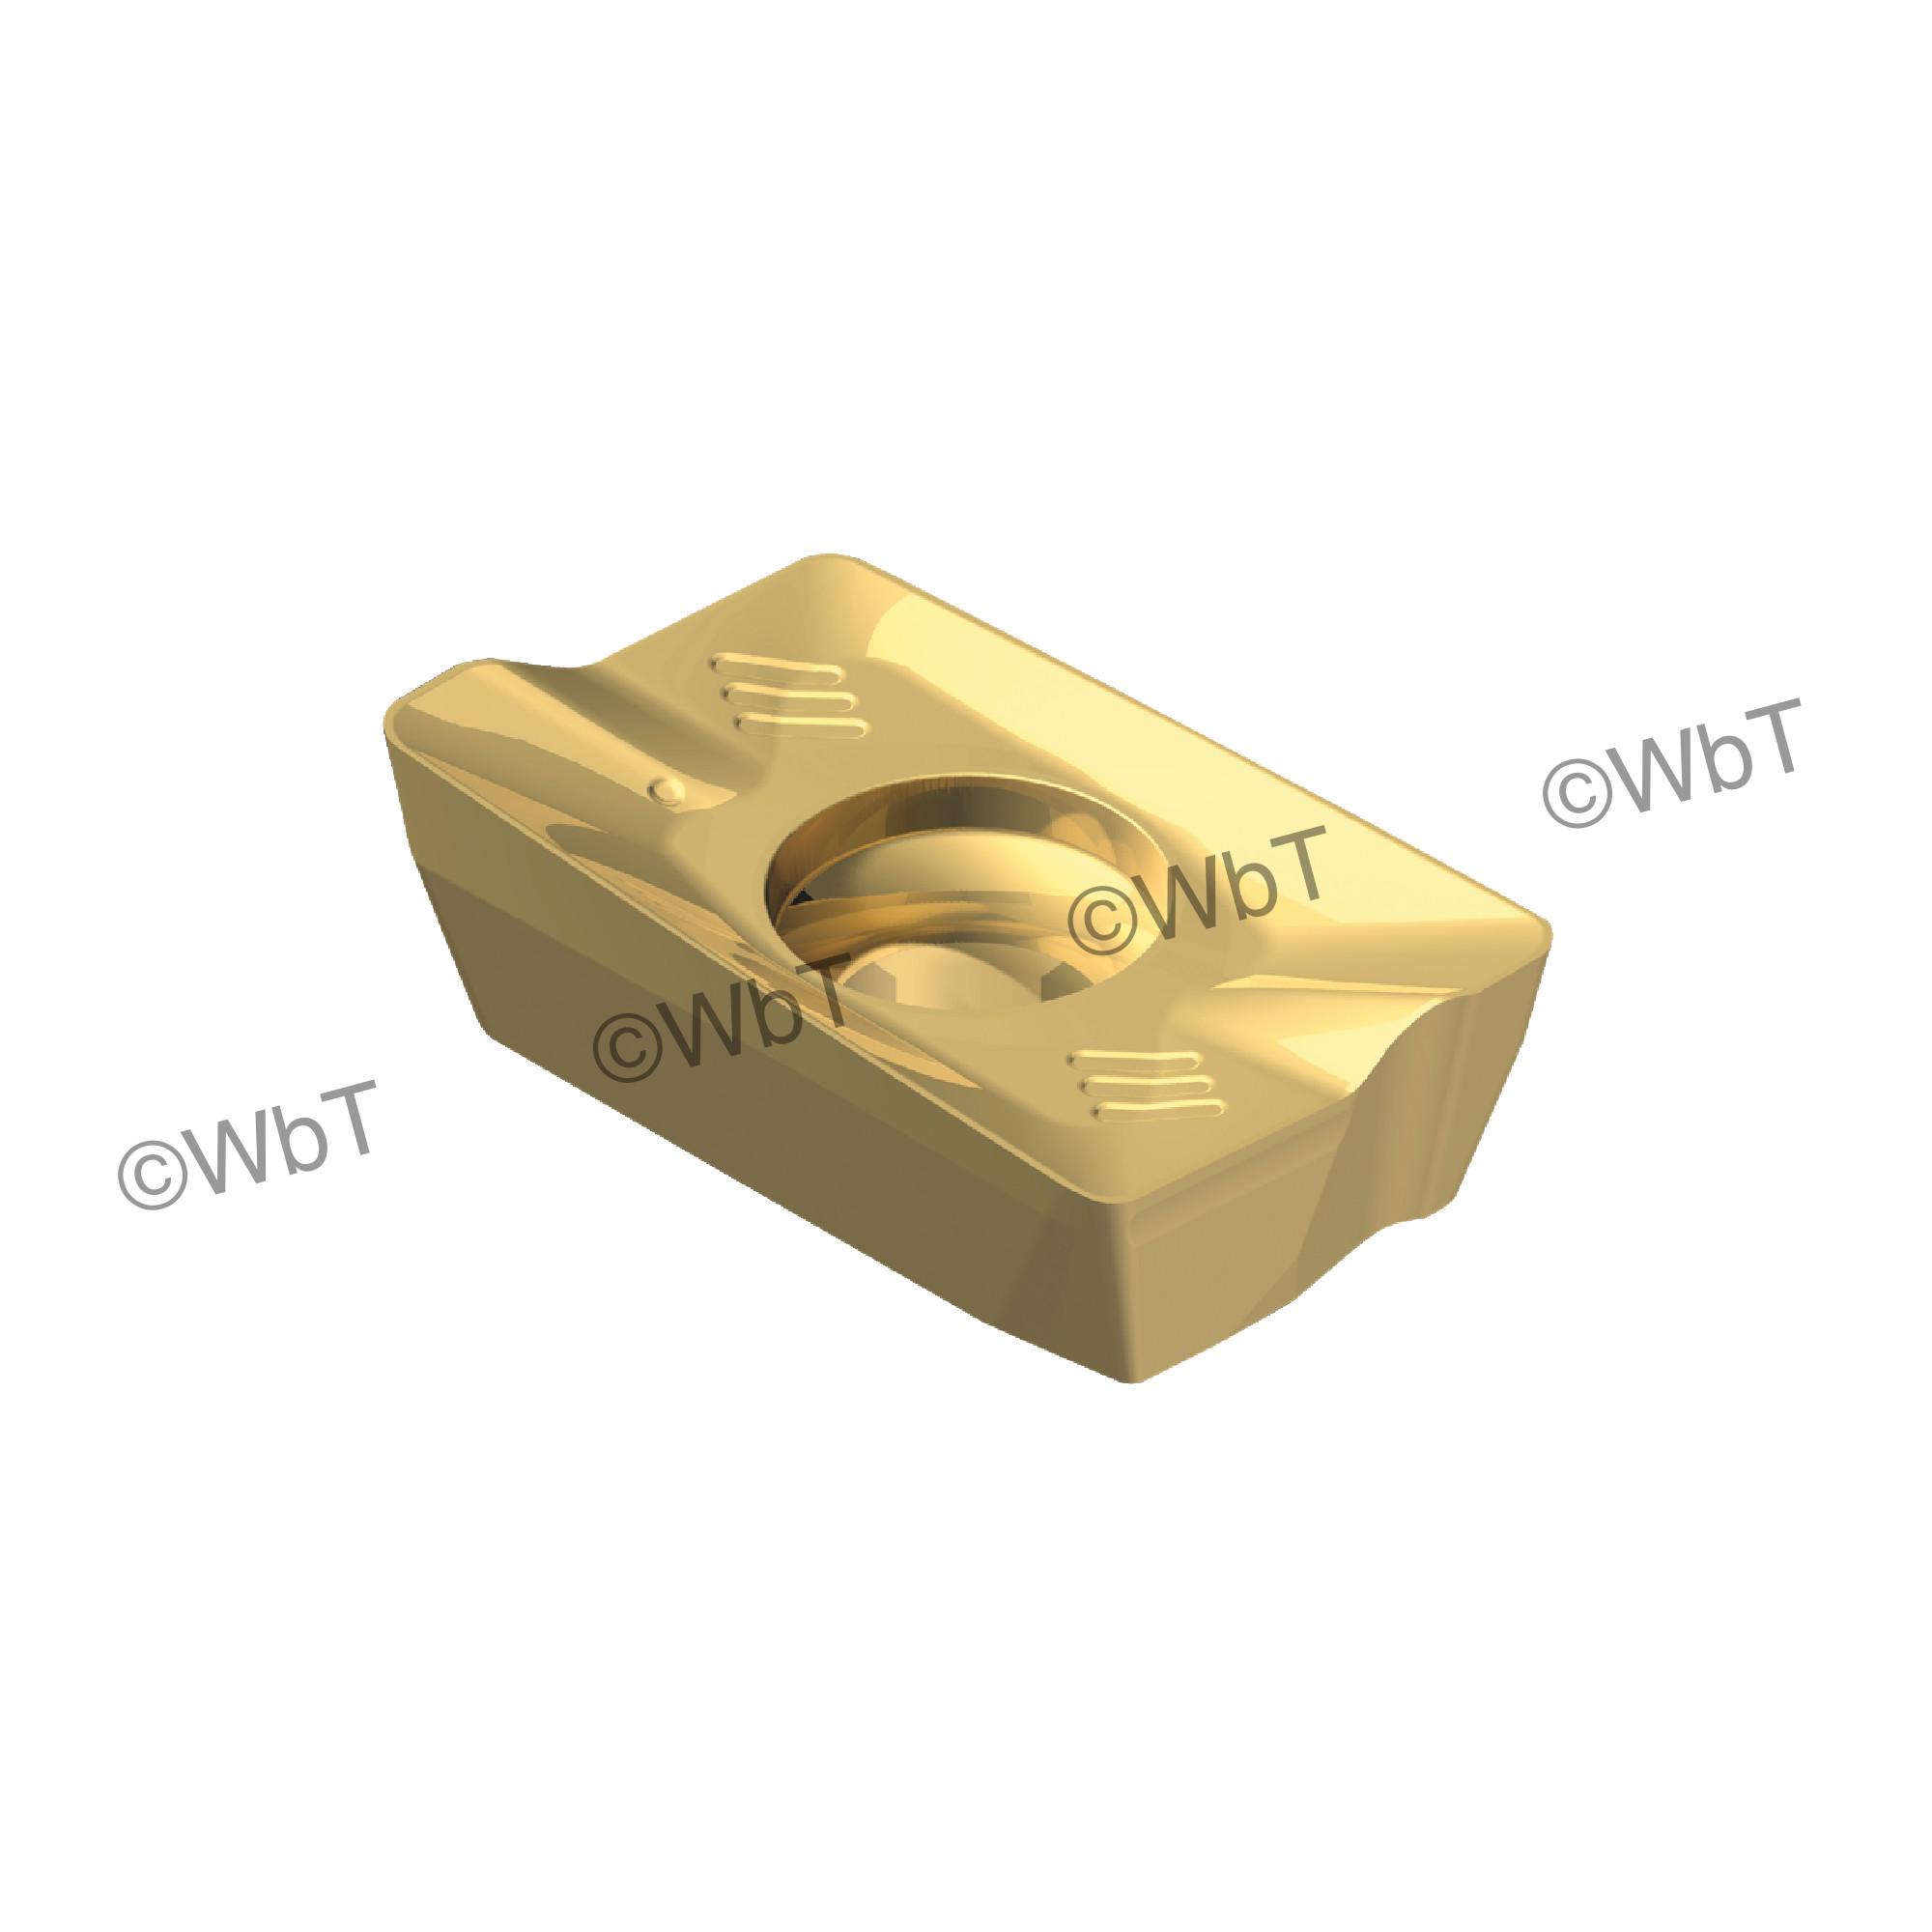 AKUMA - APKT1003PDR-M1 CM30P Parallelogram / Indexable Carbide Milling Insert